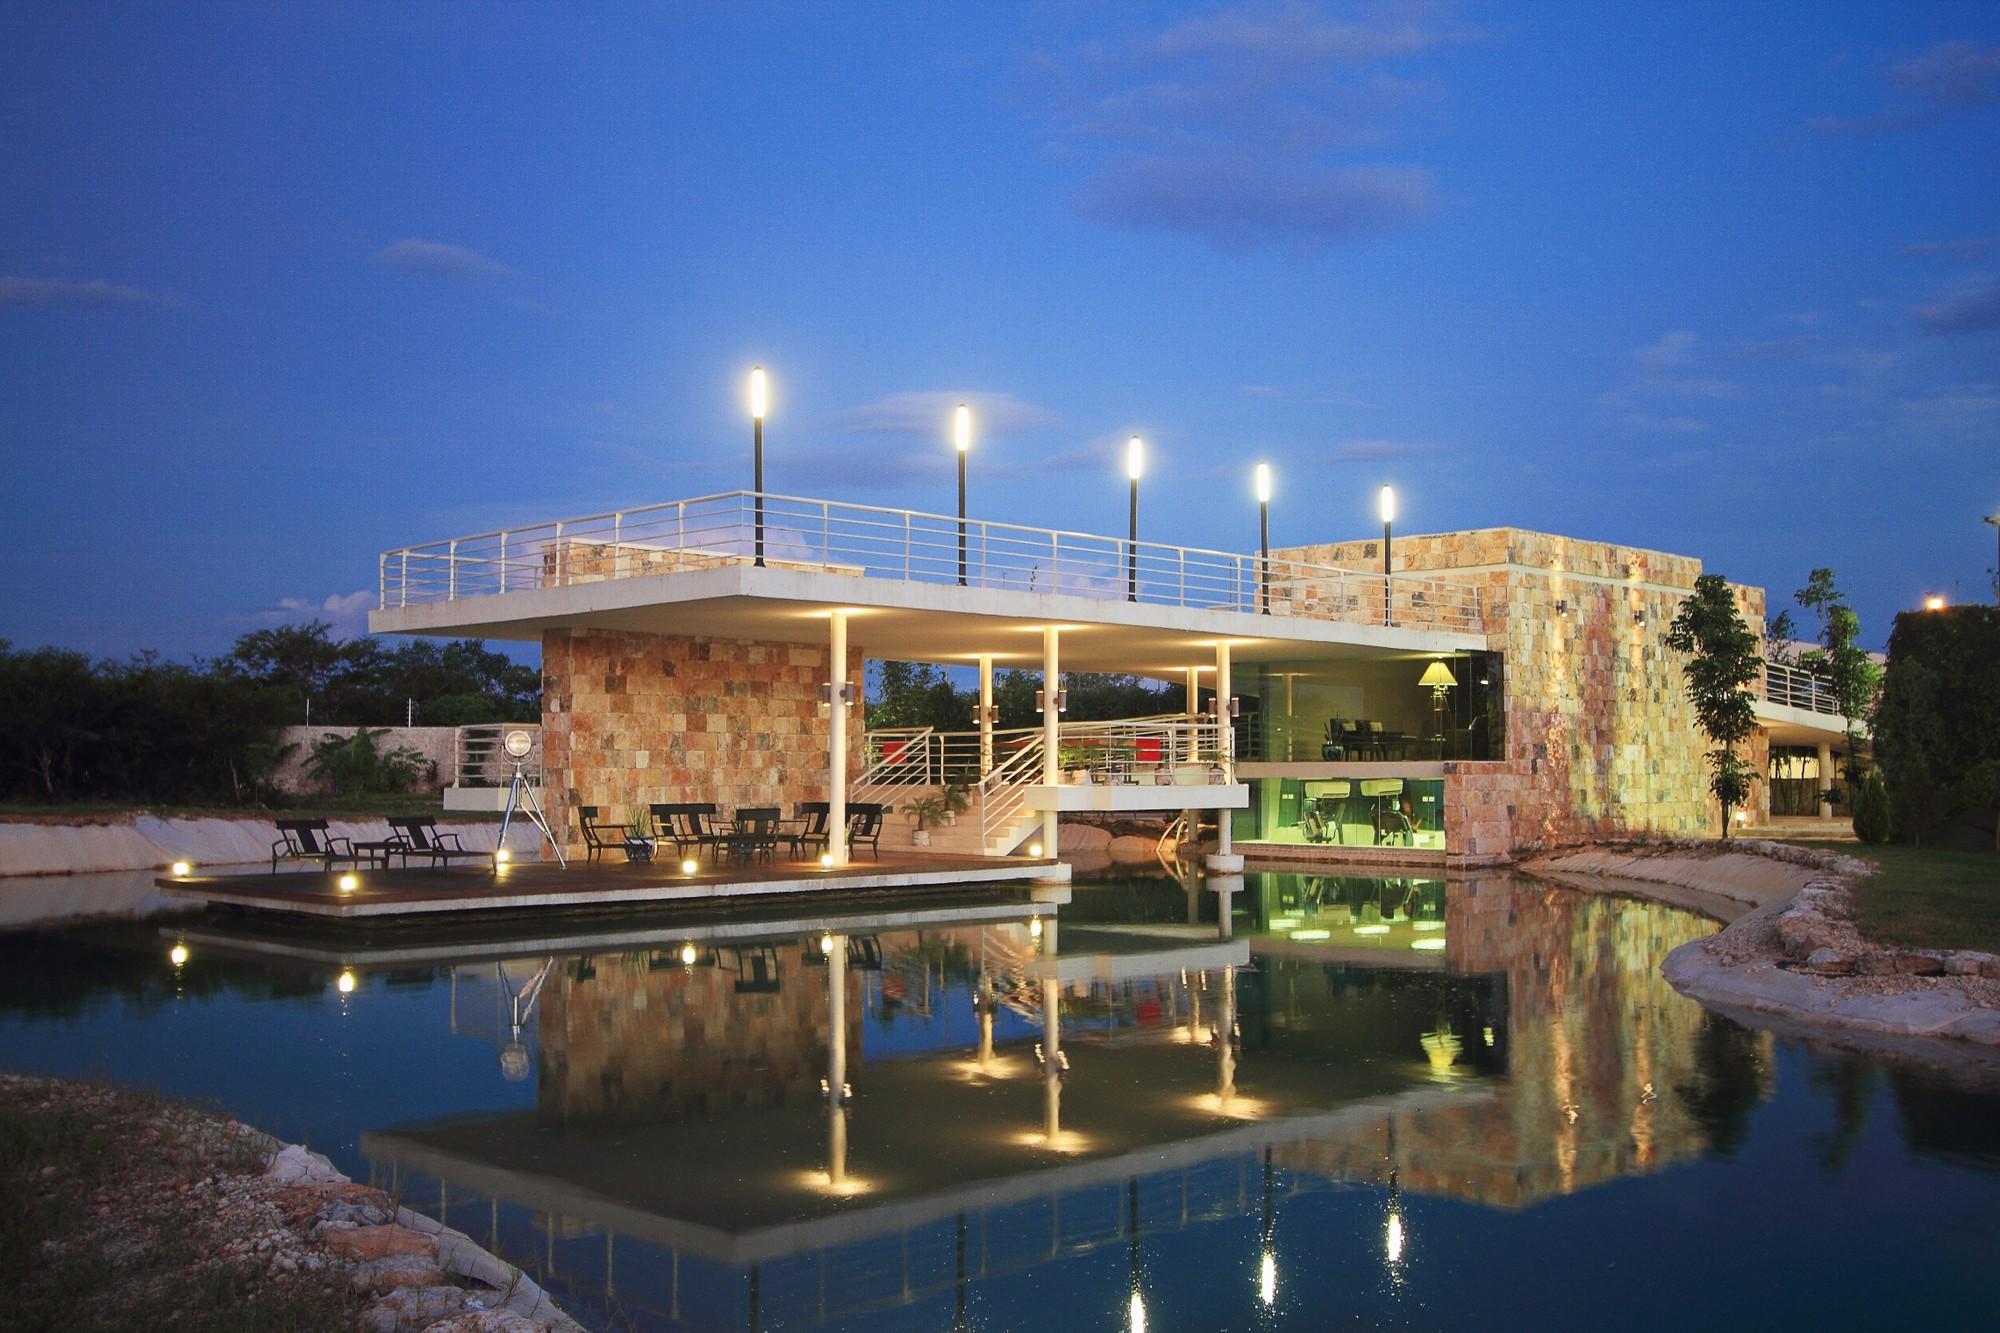 Club House Punta Lago / Seijo Peon Arquitectos, © Tamara Uribe